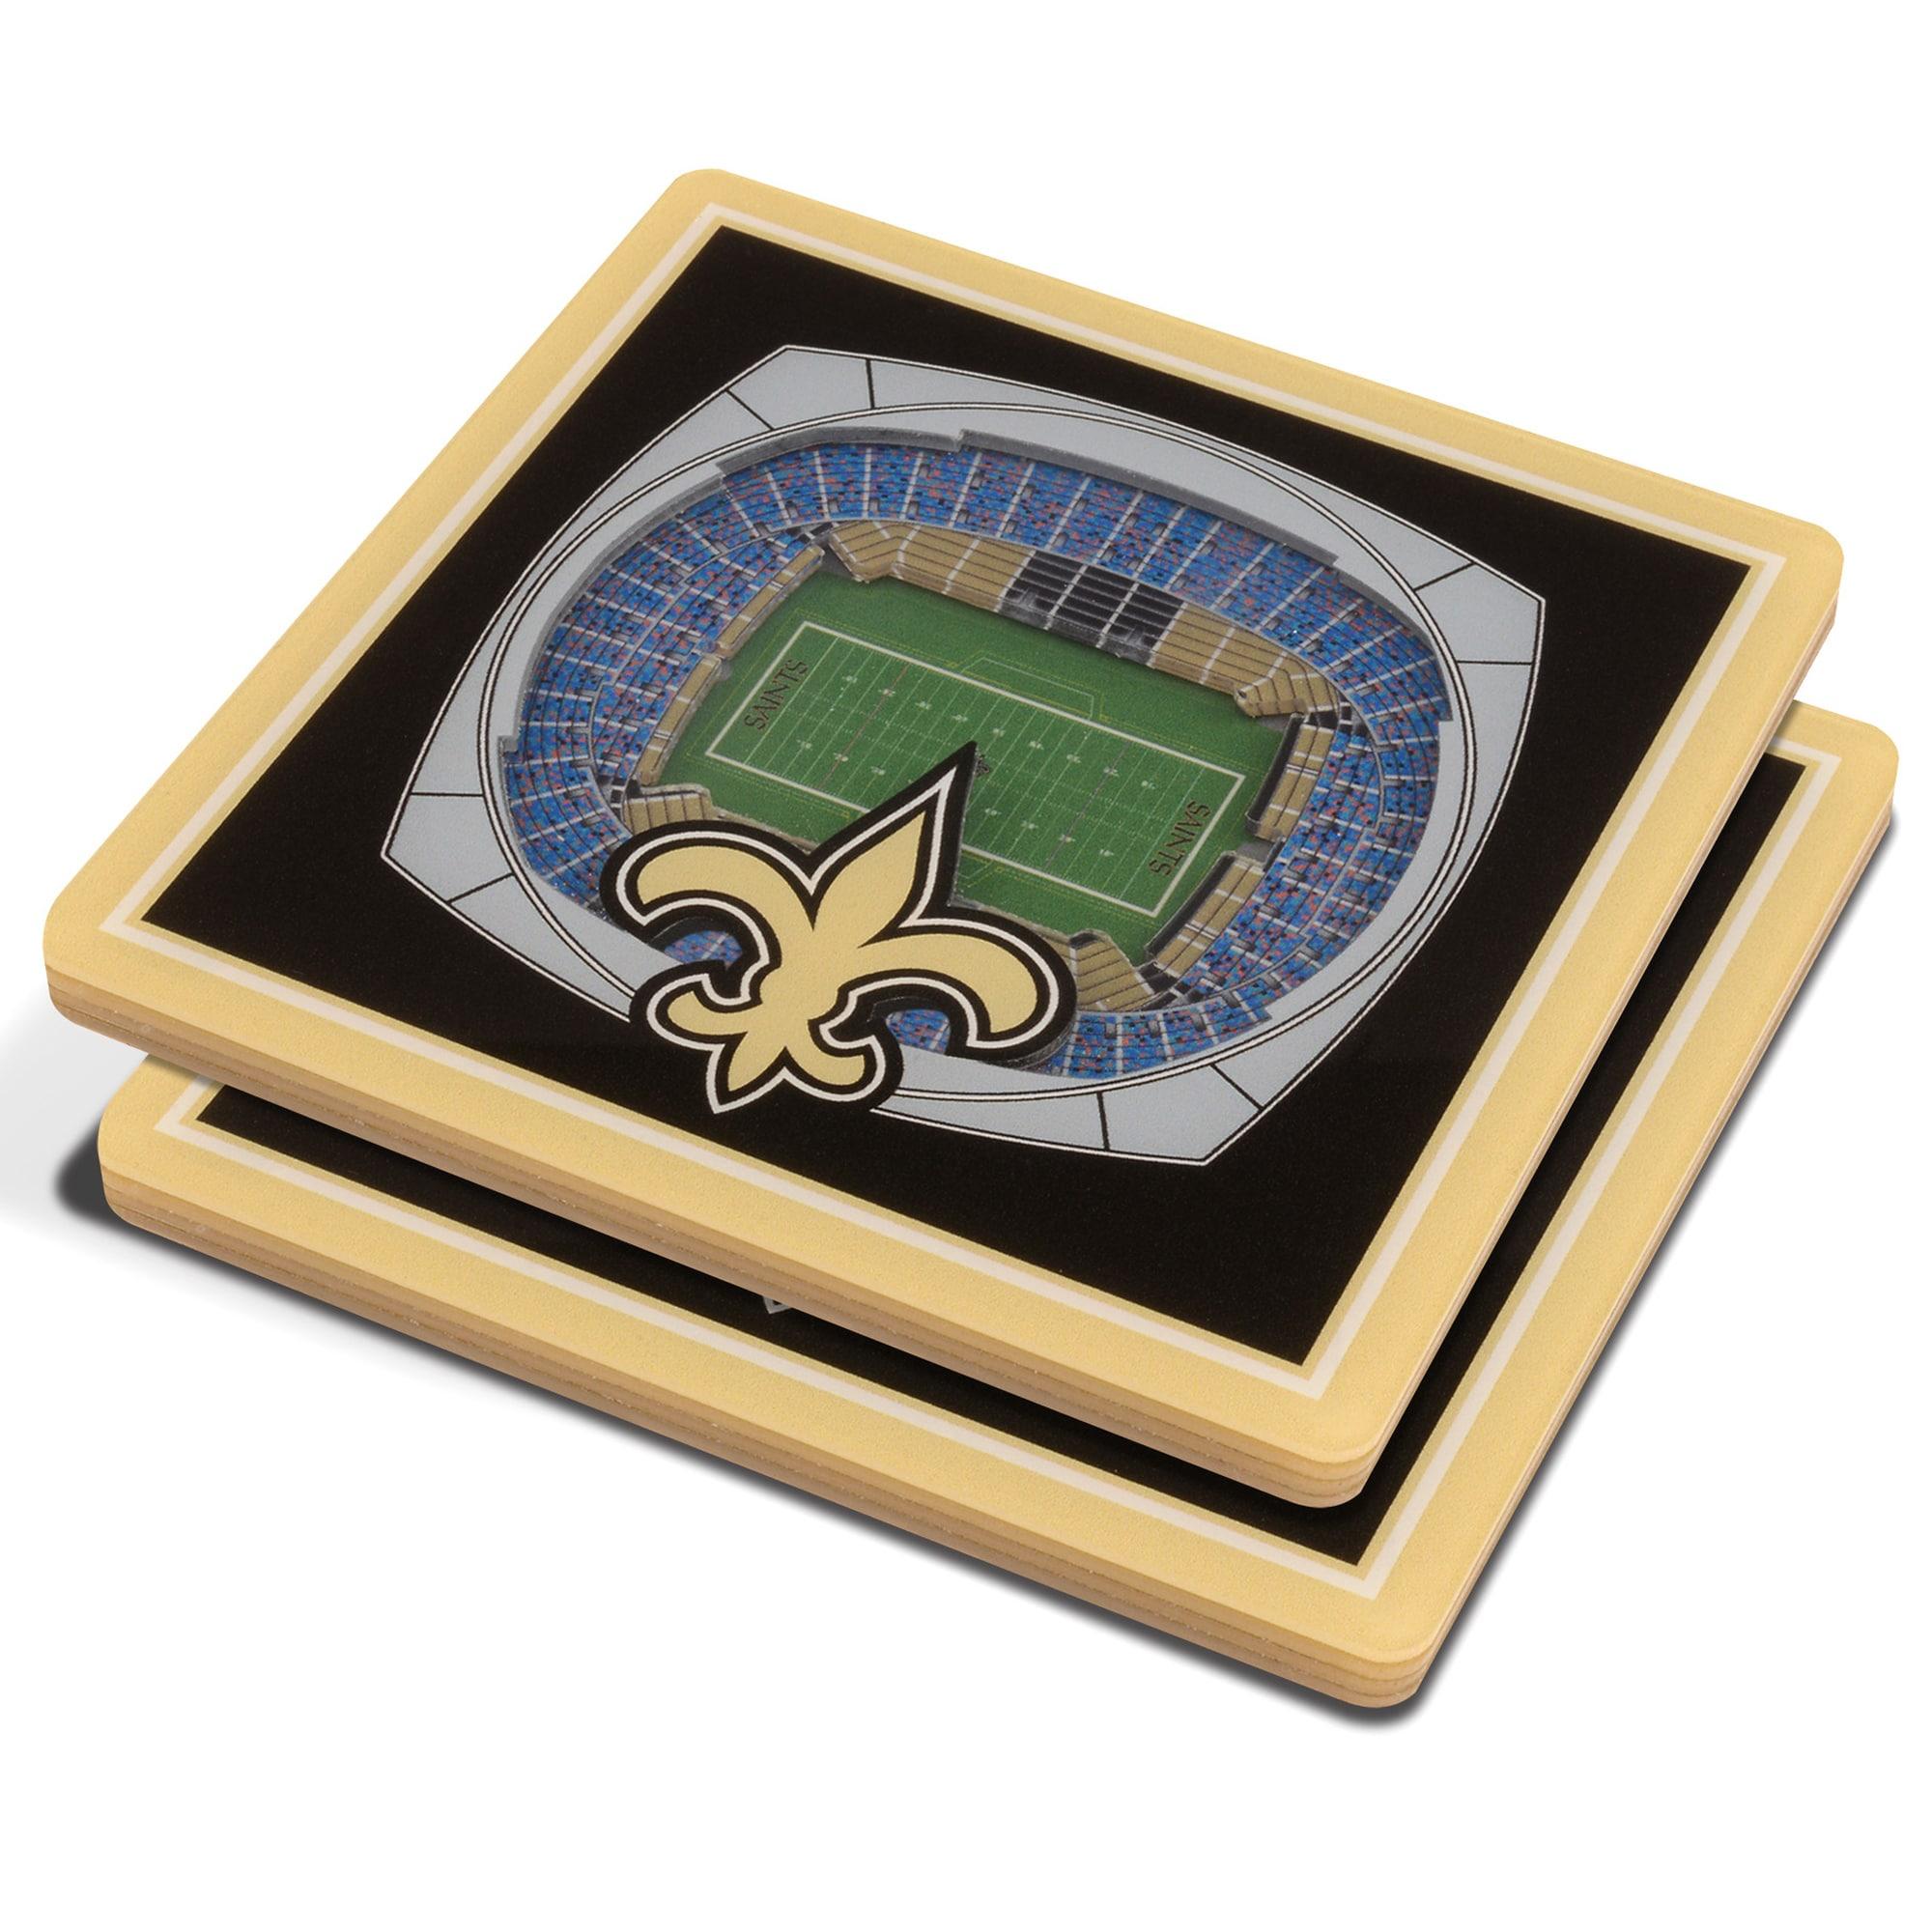 New Orleans Saints 3D StadiumViews Coasters - Black